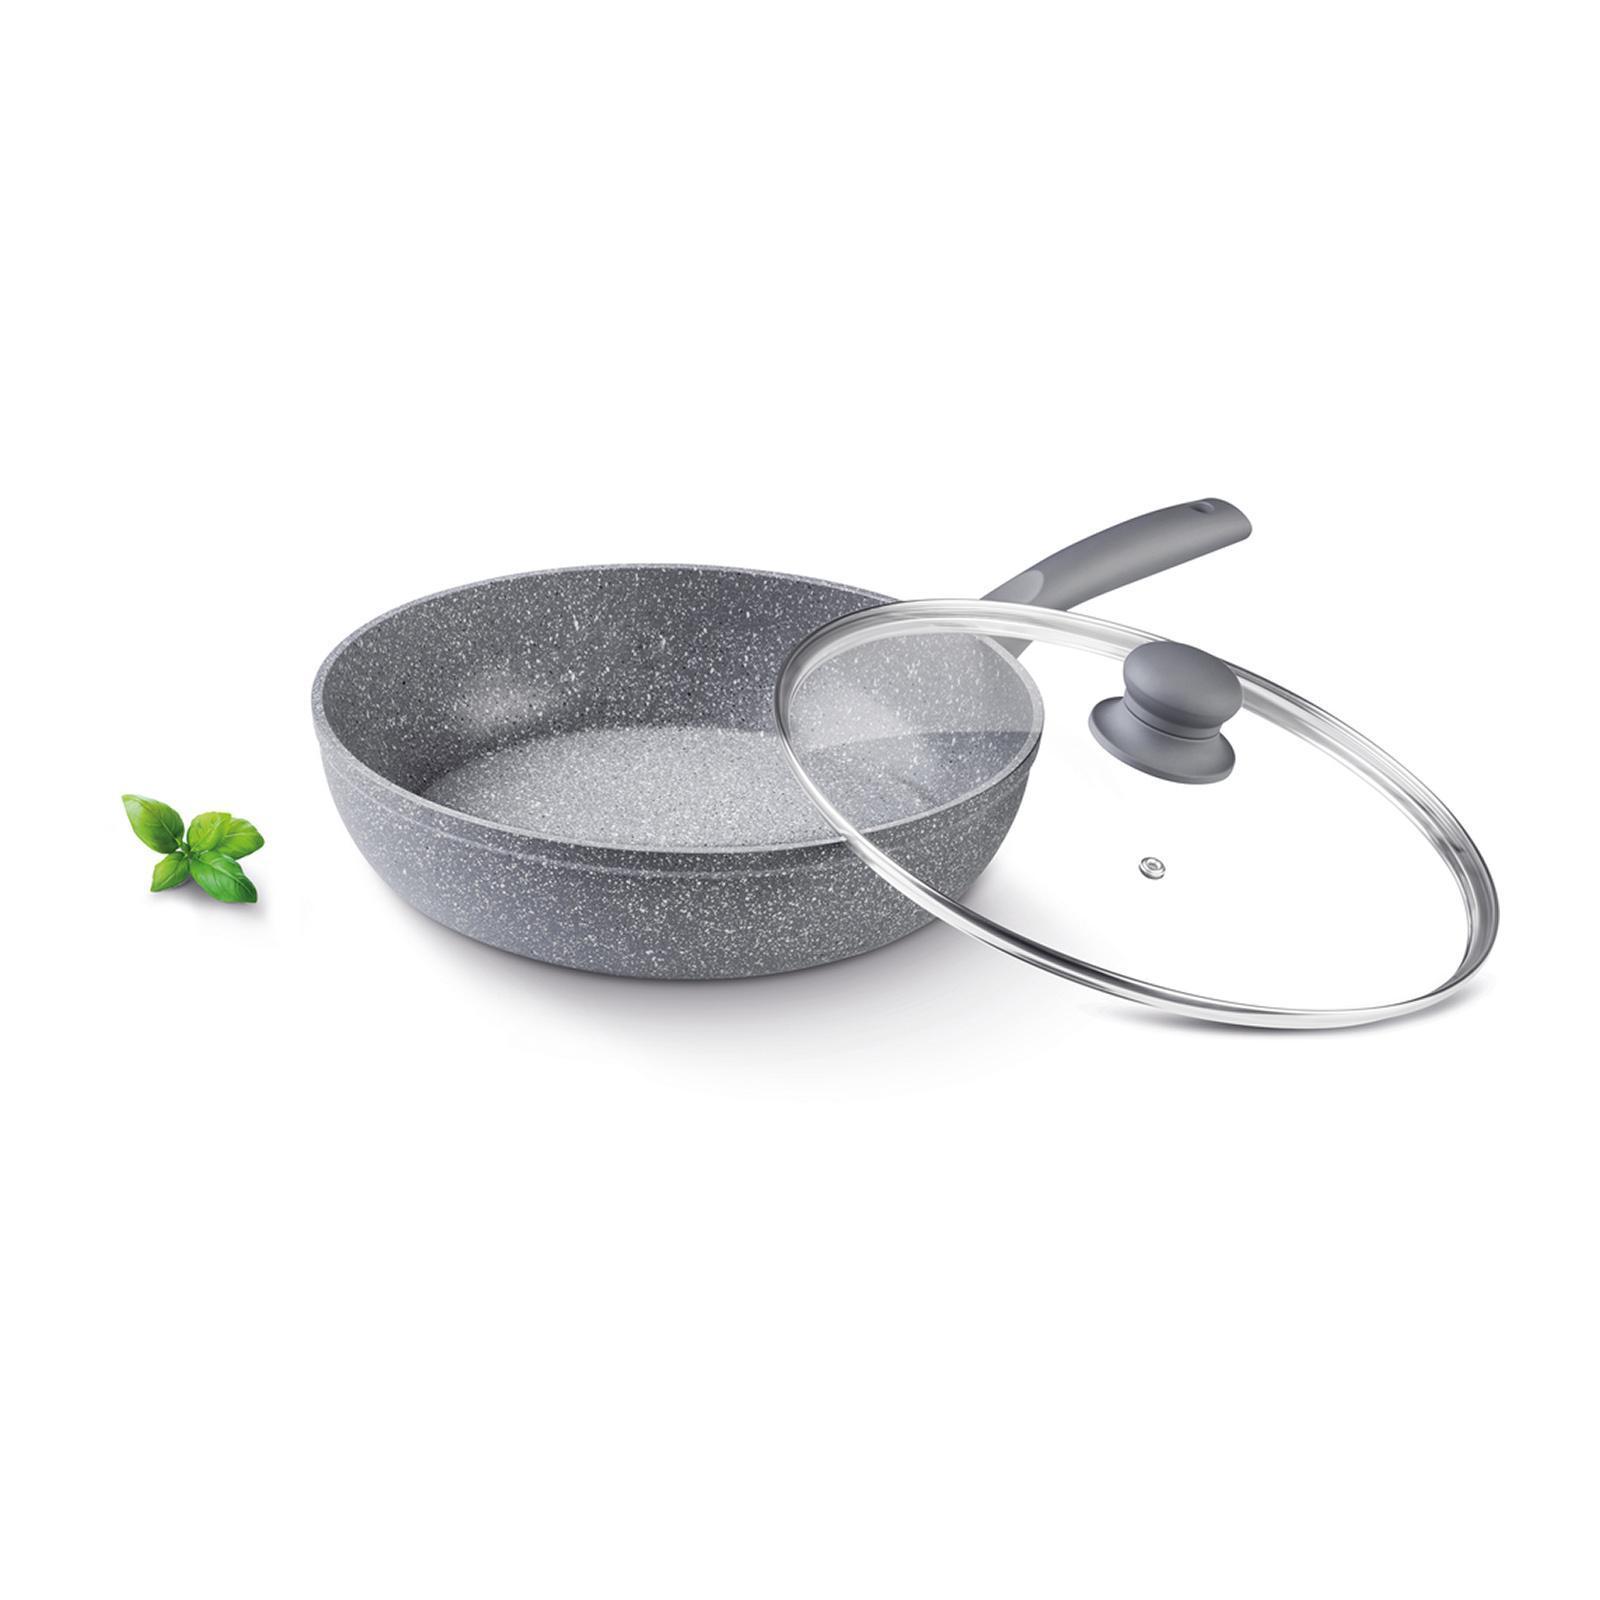 Lamart Deep Pan W/ Lid Stone 28Cm (Grey)